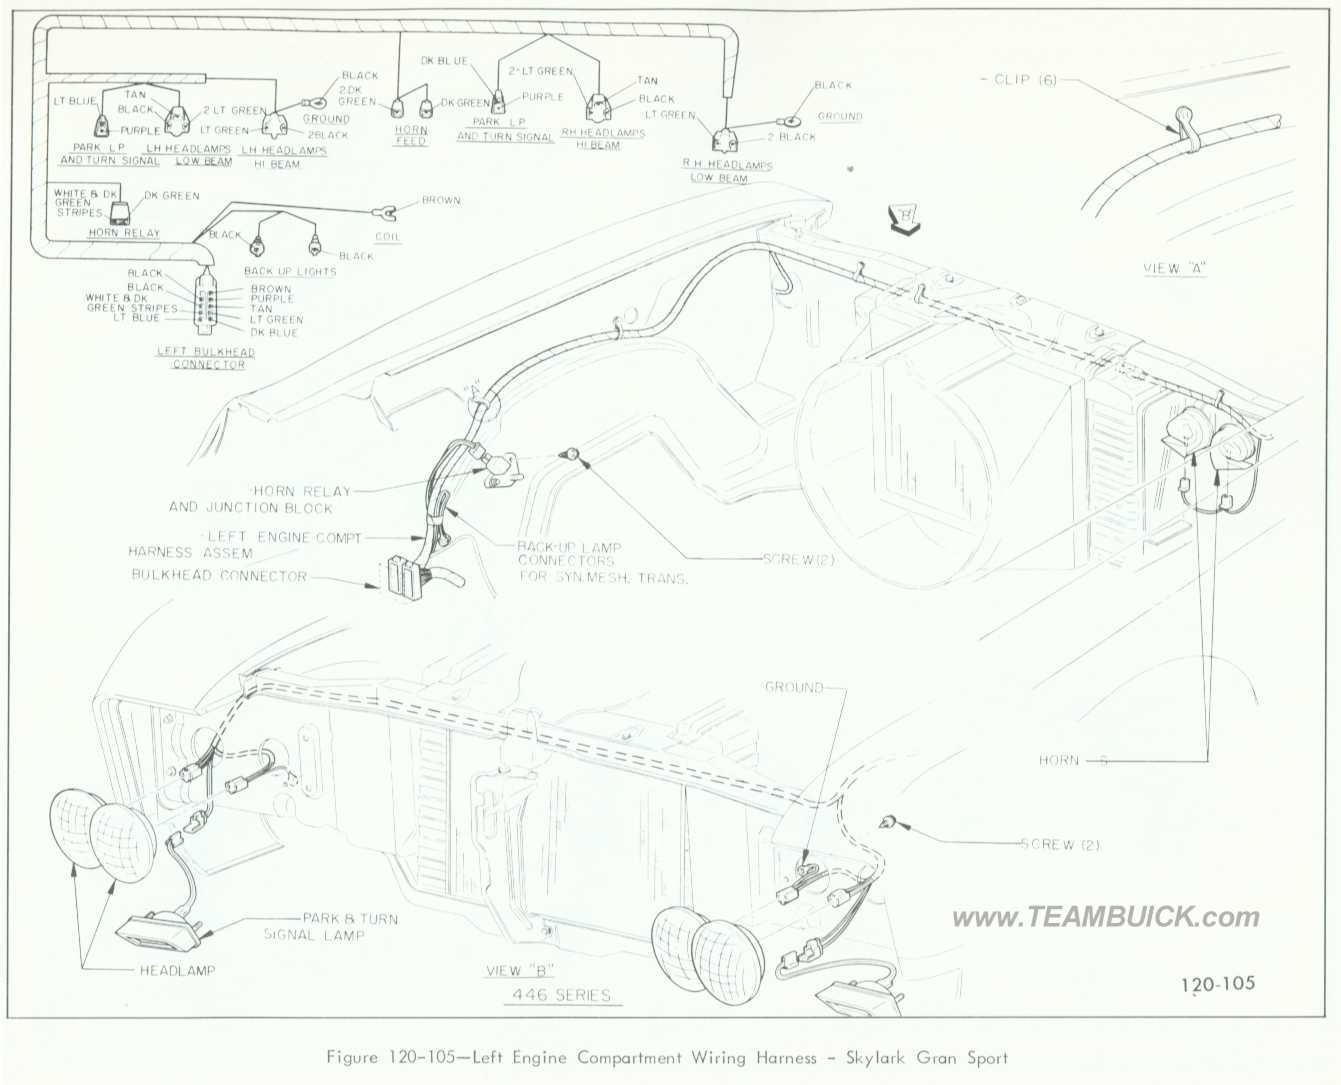 Buick Skylark Gran Sport Left Engine Compartment